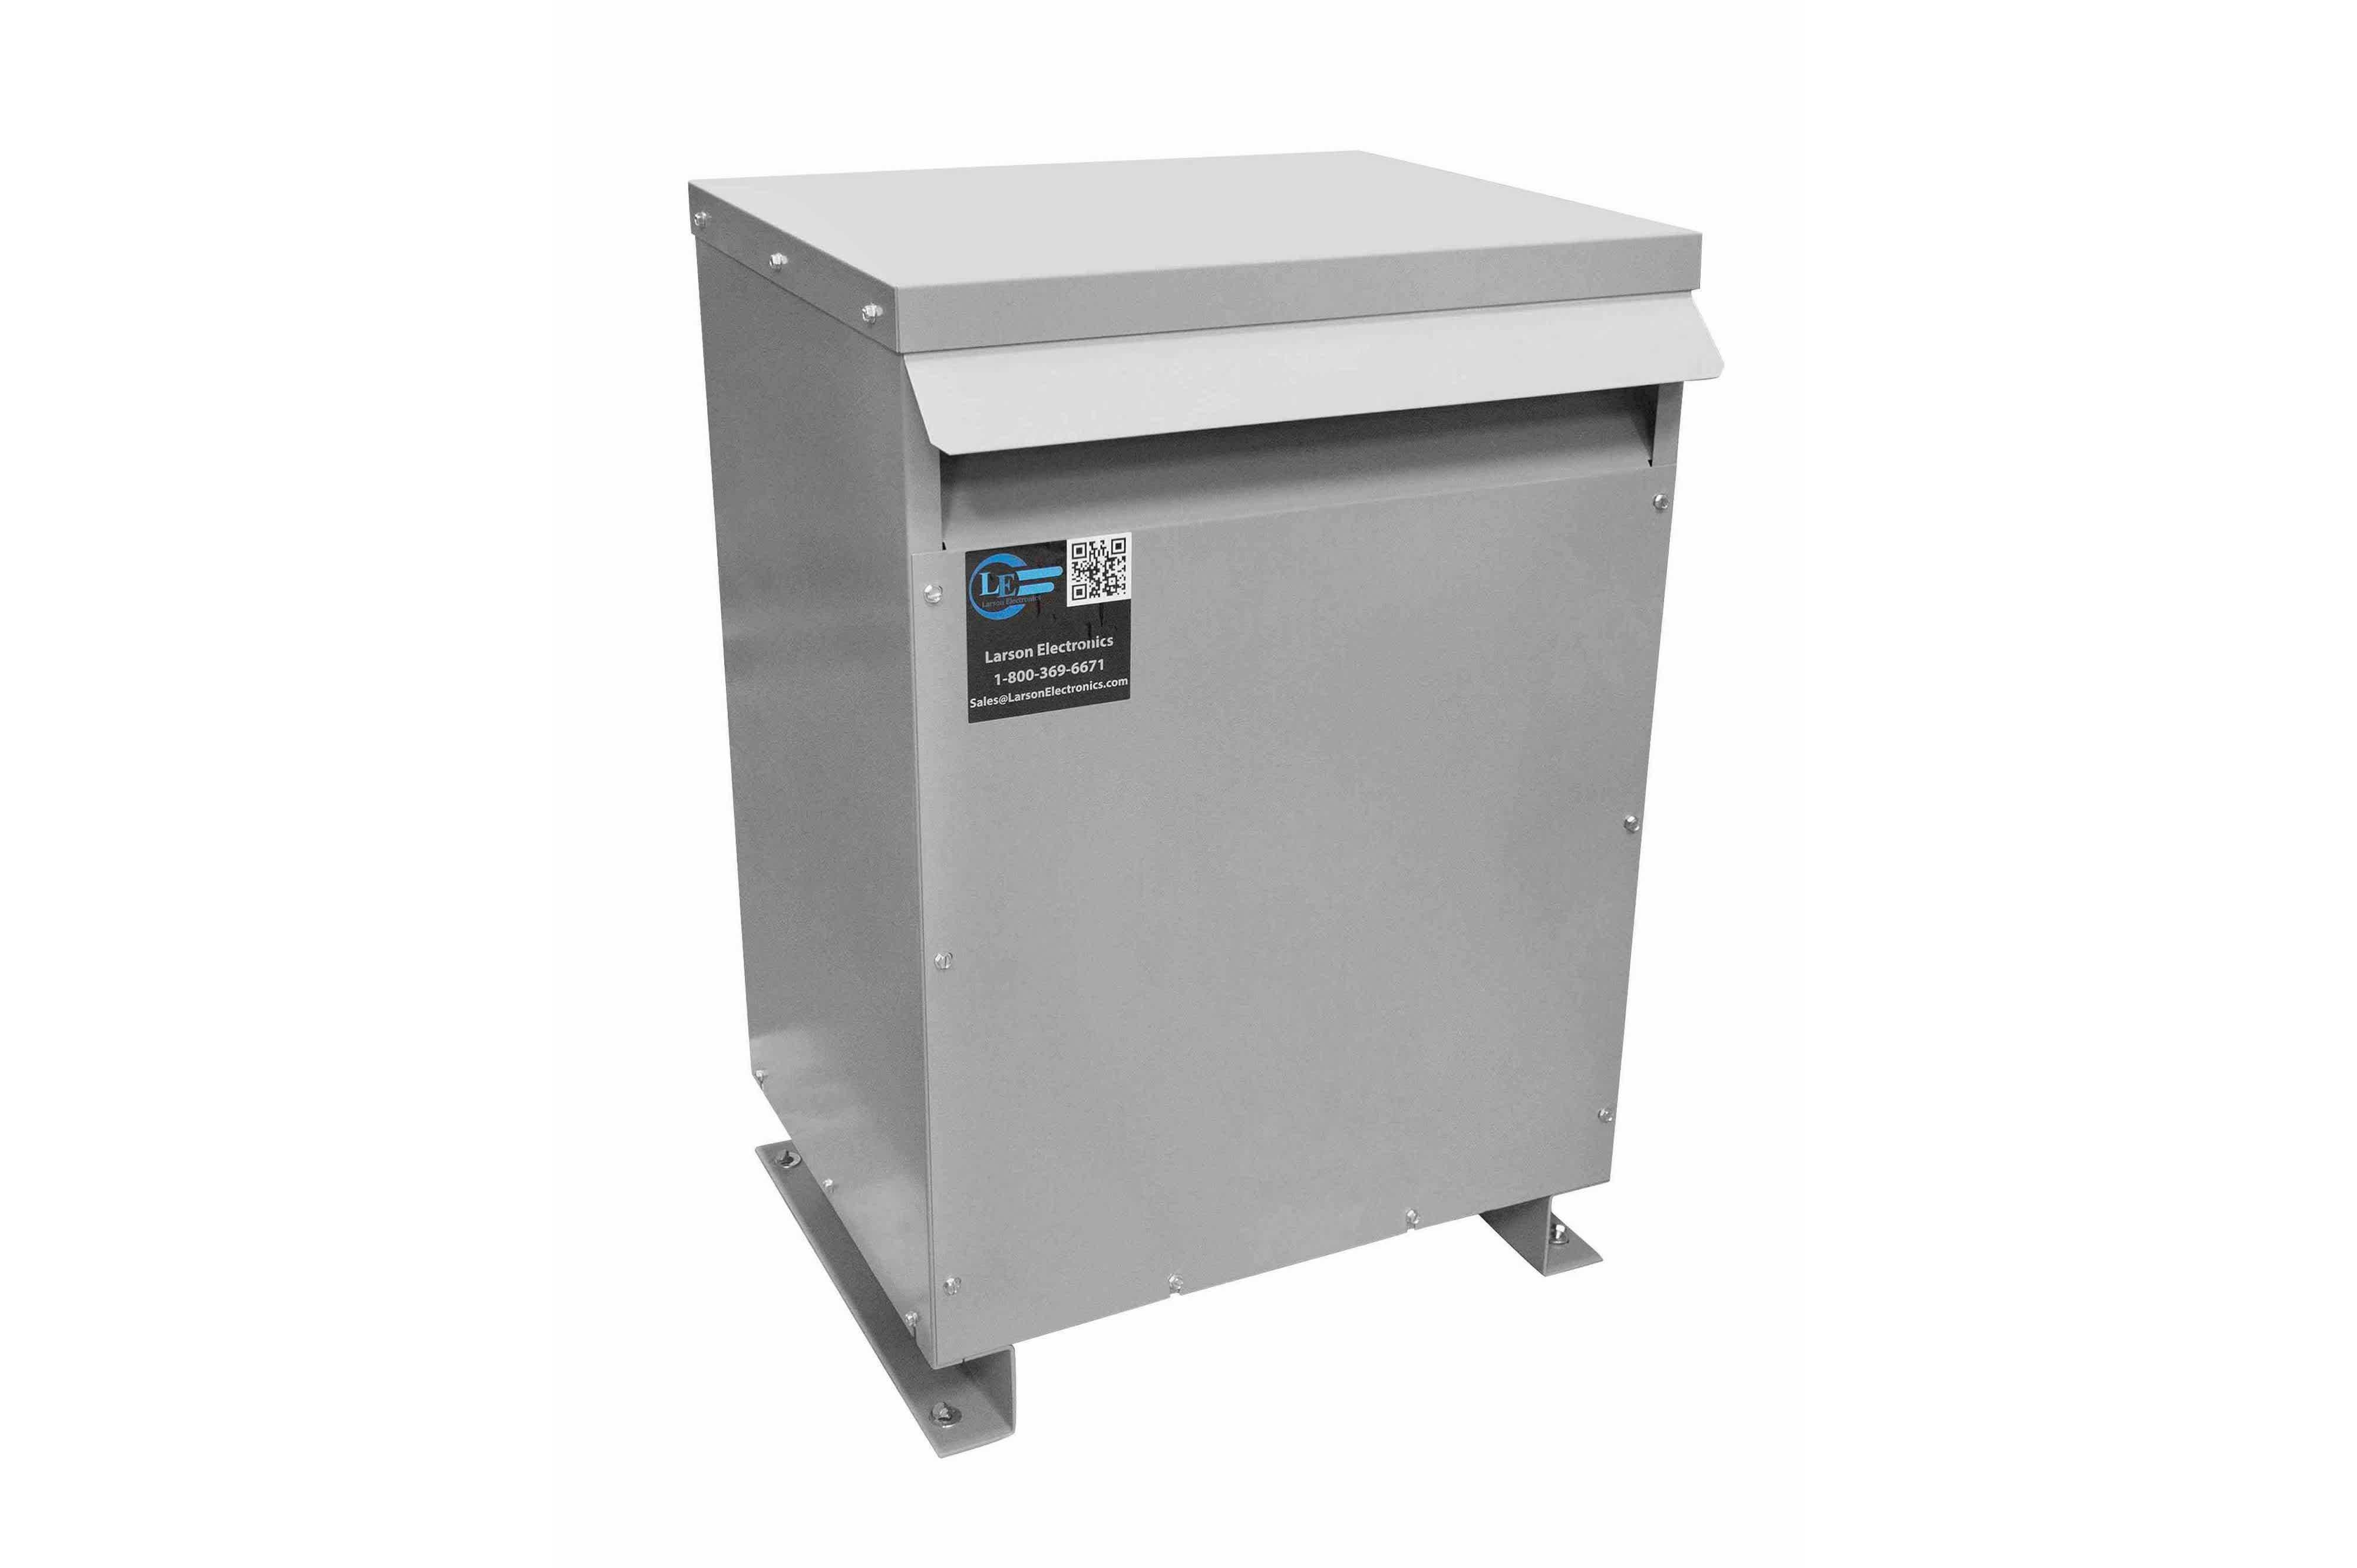 15 kVA 3PH Isolation Transformer, 480V Wye Primary, 480Y/277 Wye-N Secondary, N3R, Ventilated, 60 Hz